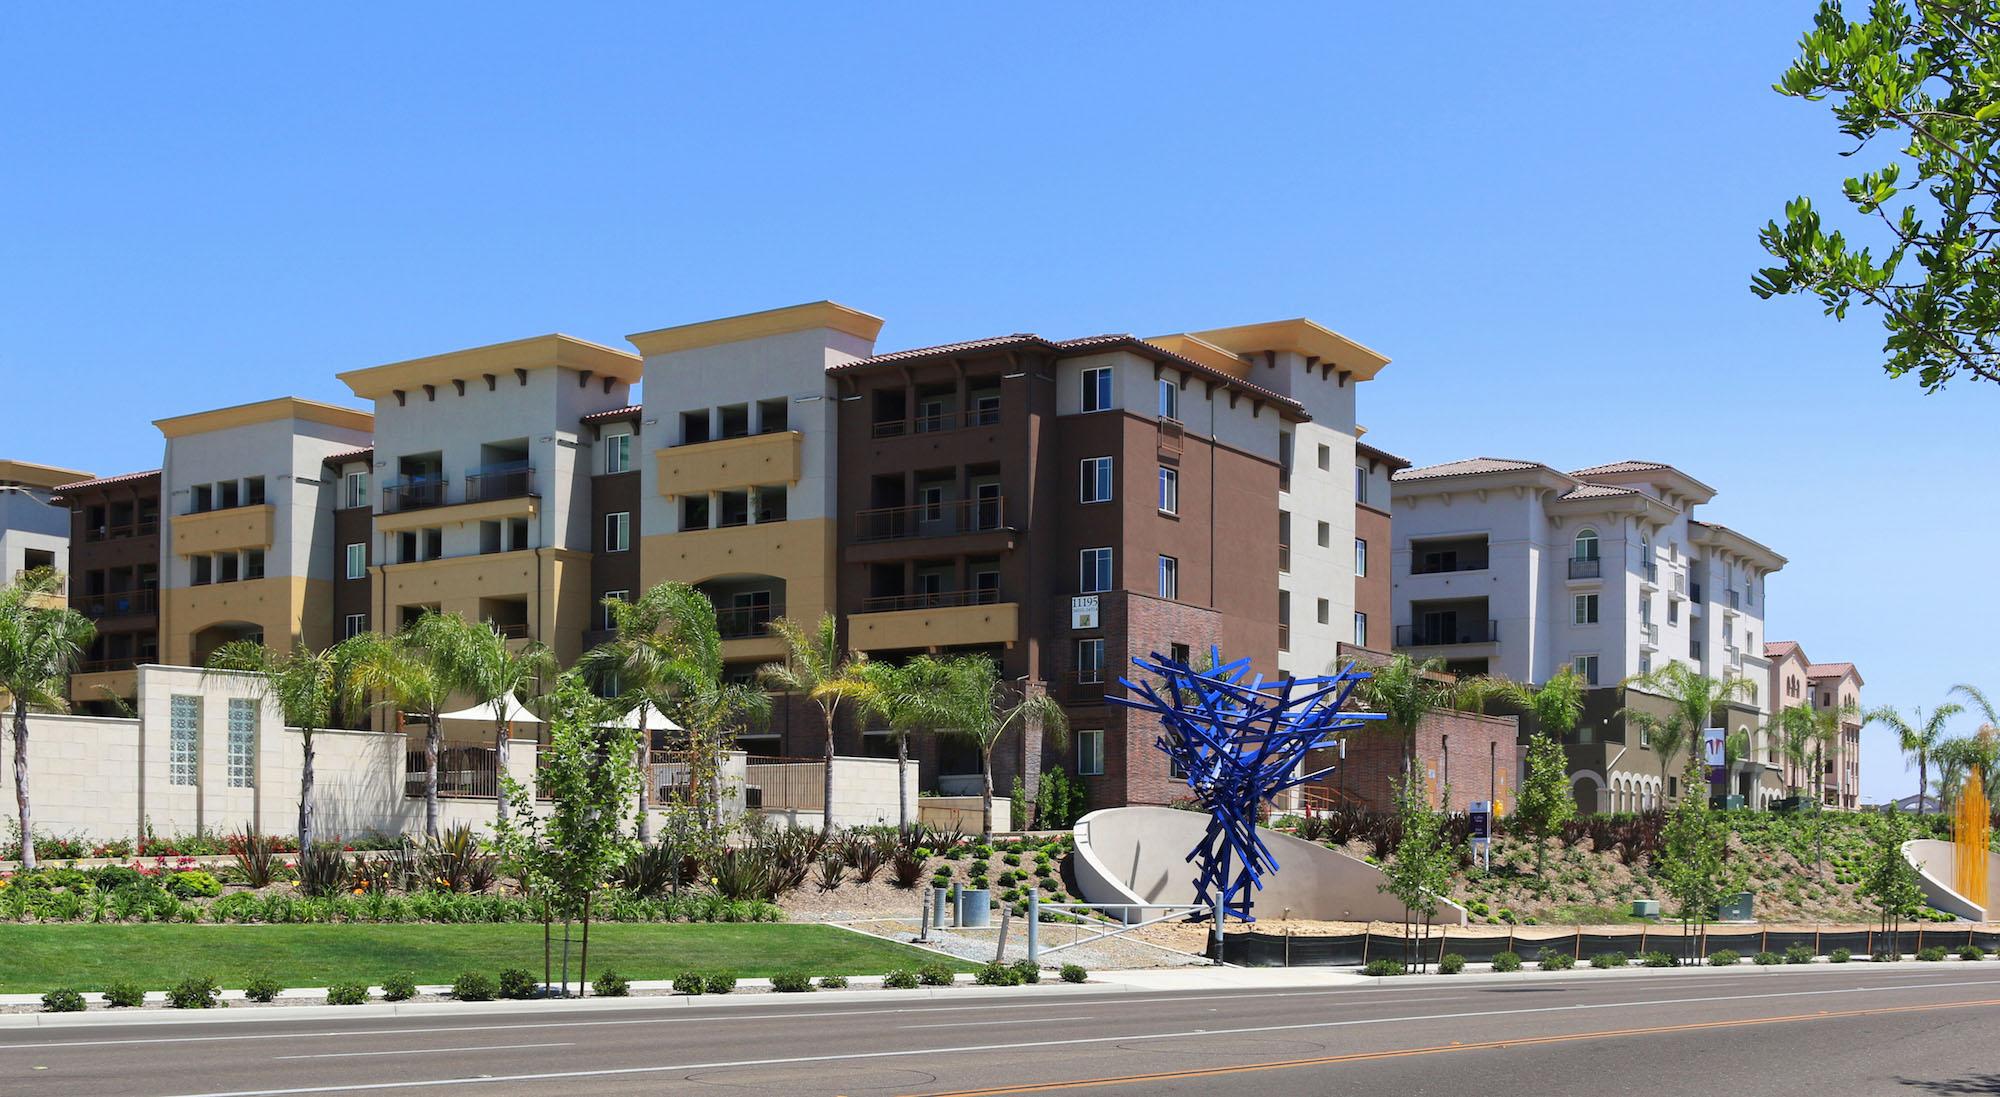 Kon Dimopoulous, Casa Mira View, San Diego, CA